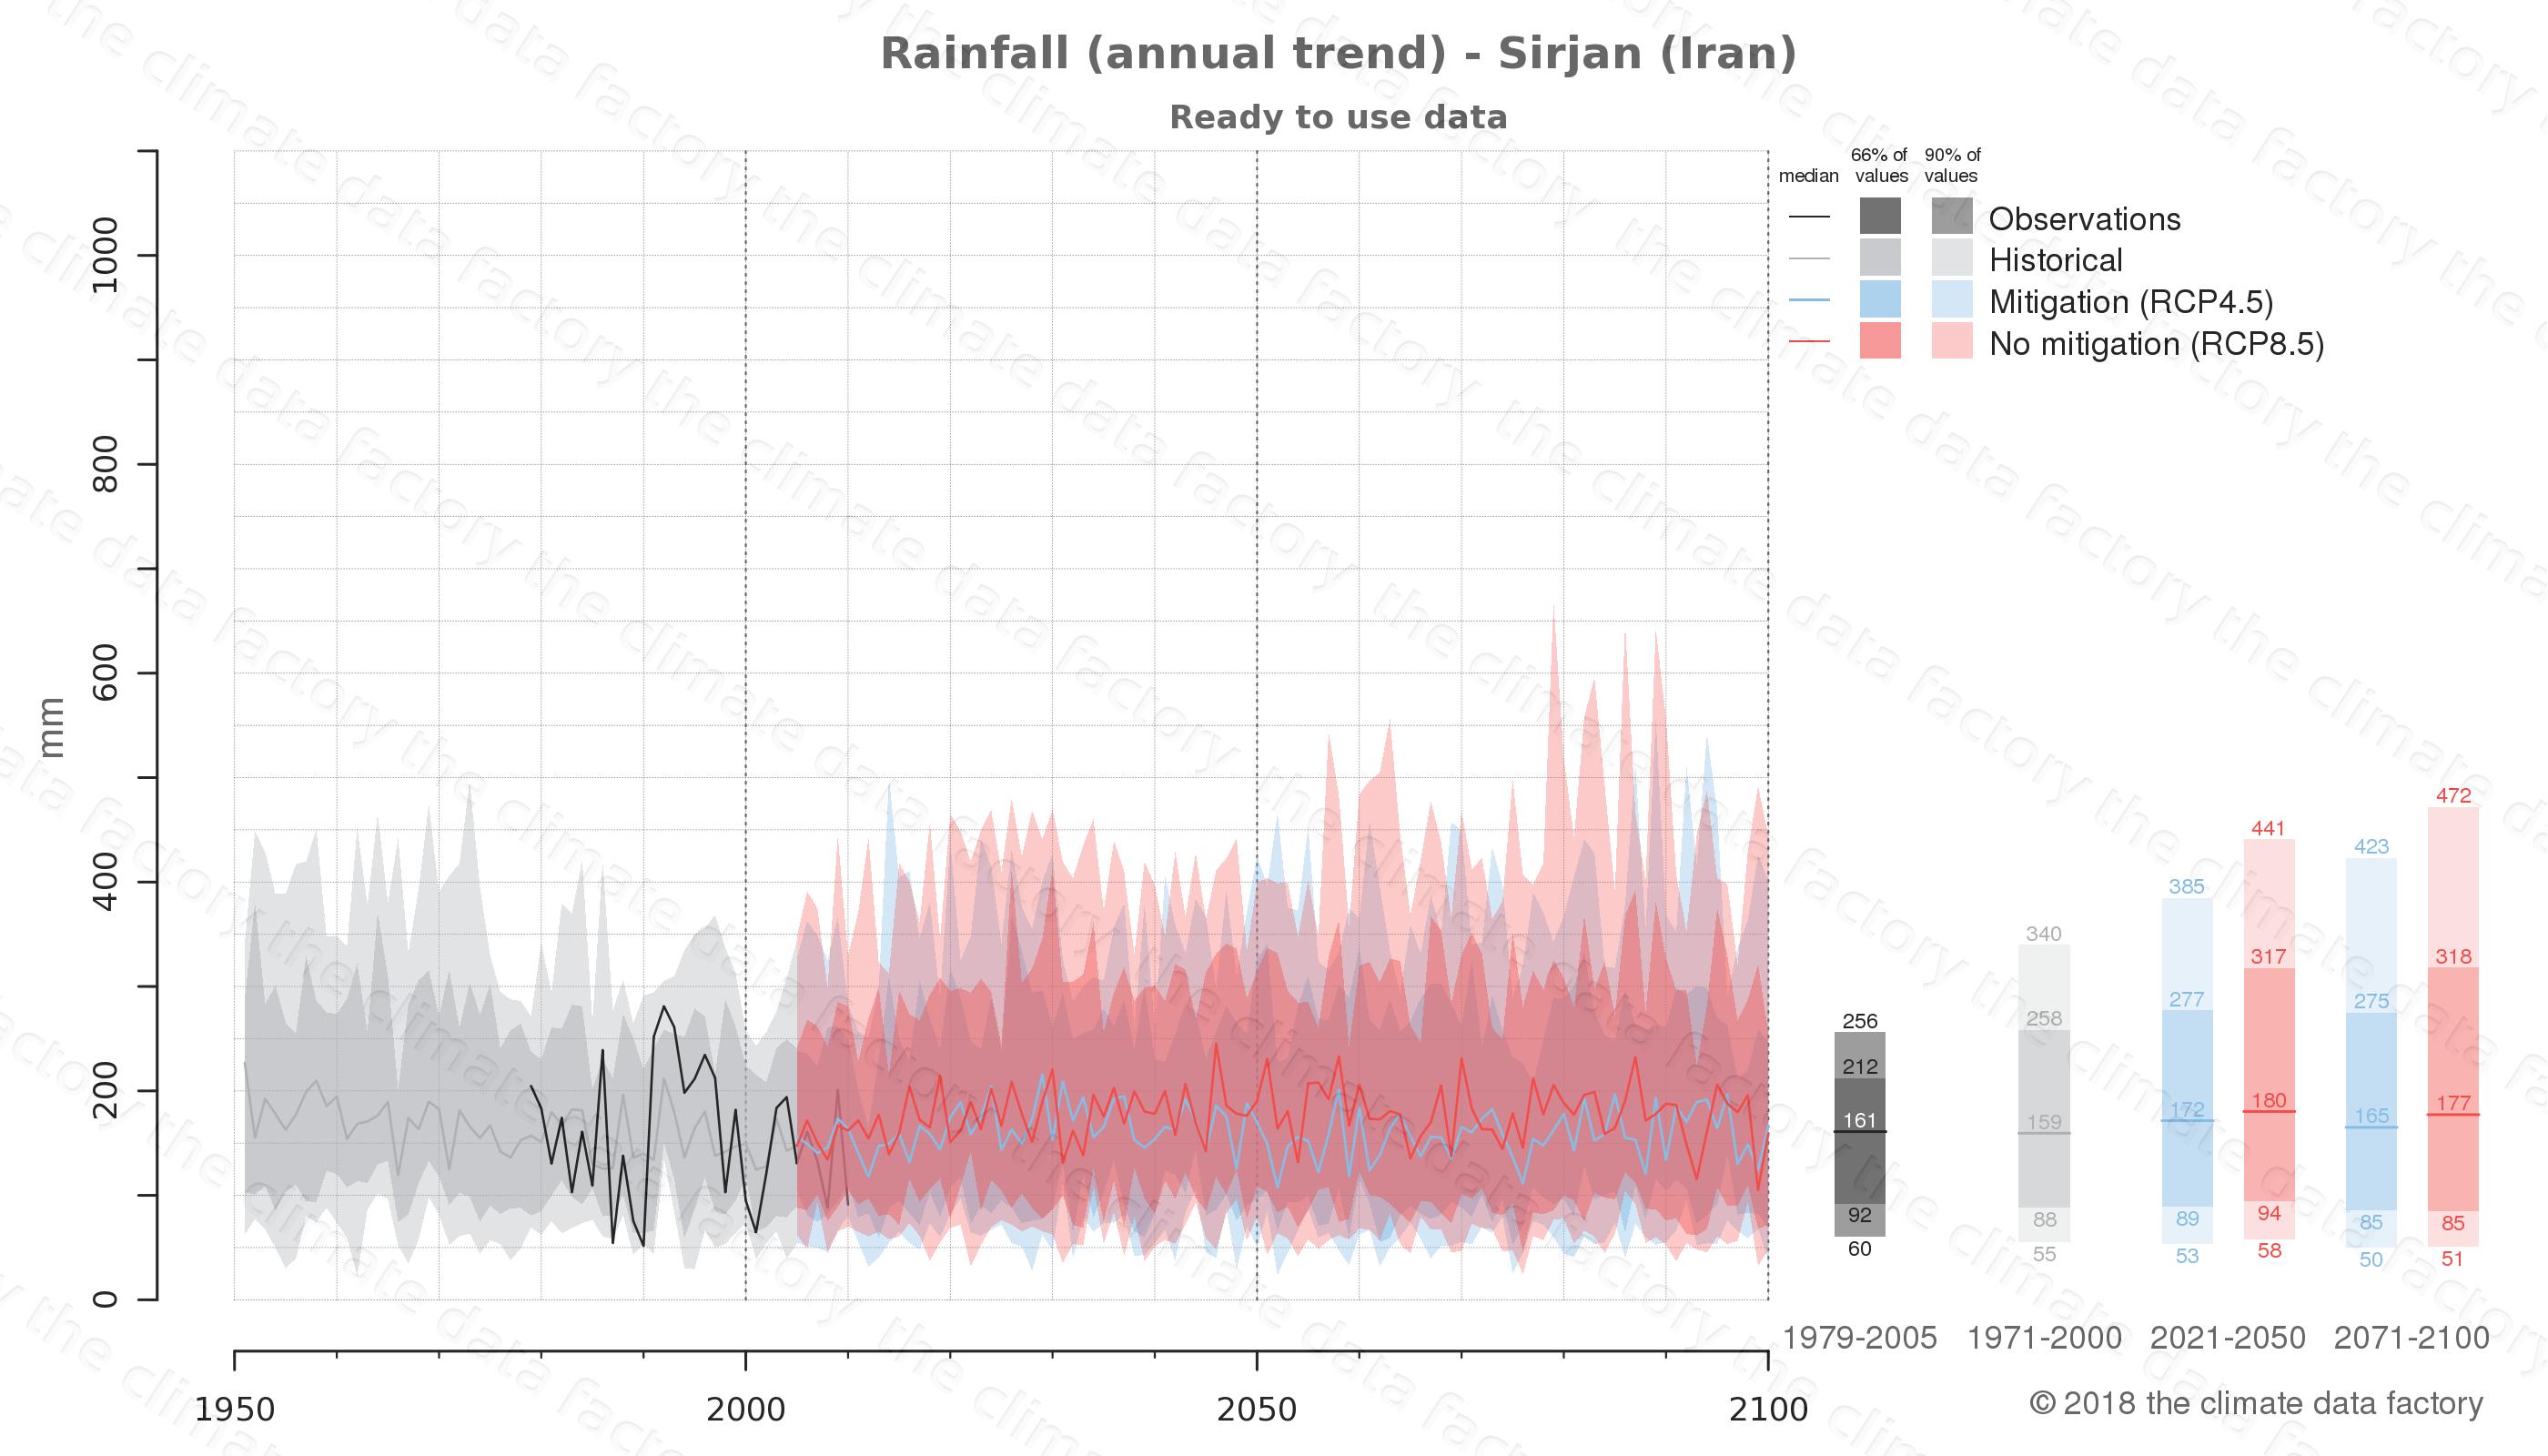 climate change data policy adaptation climate graph city data rainfall sirjan iran